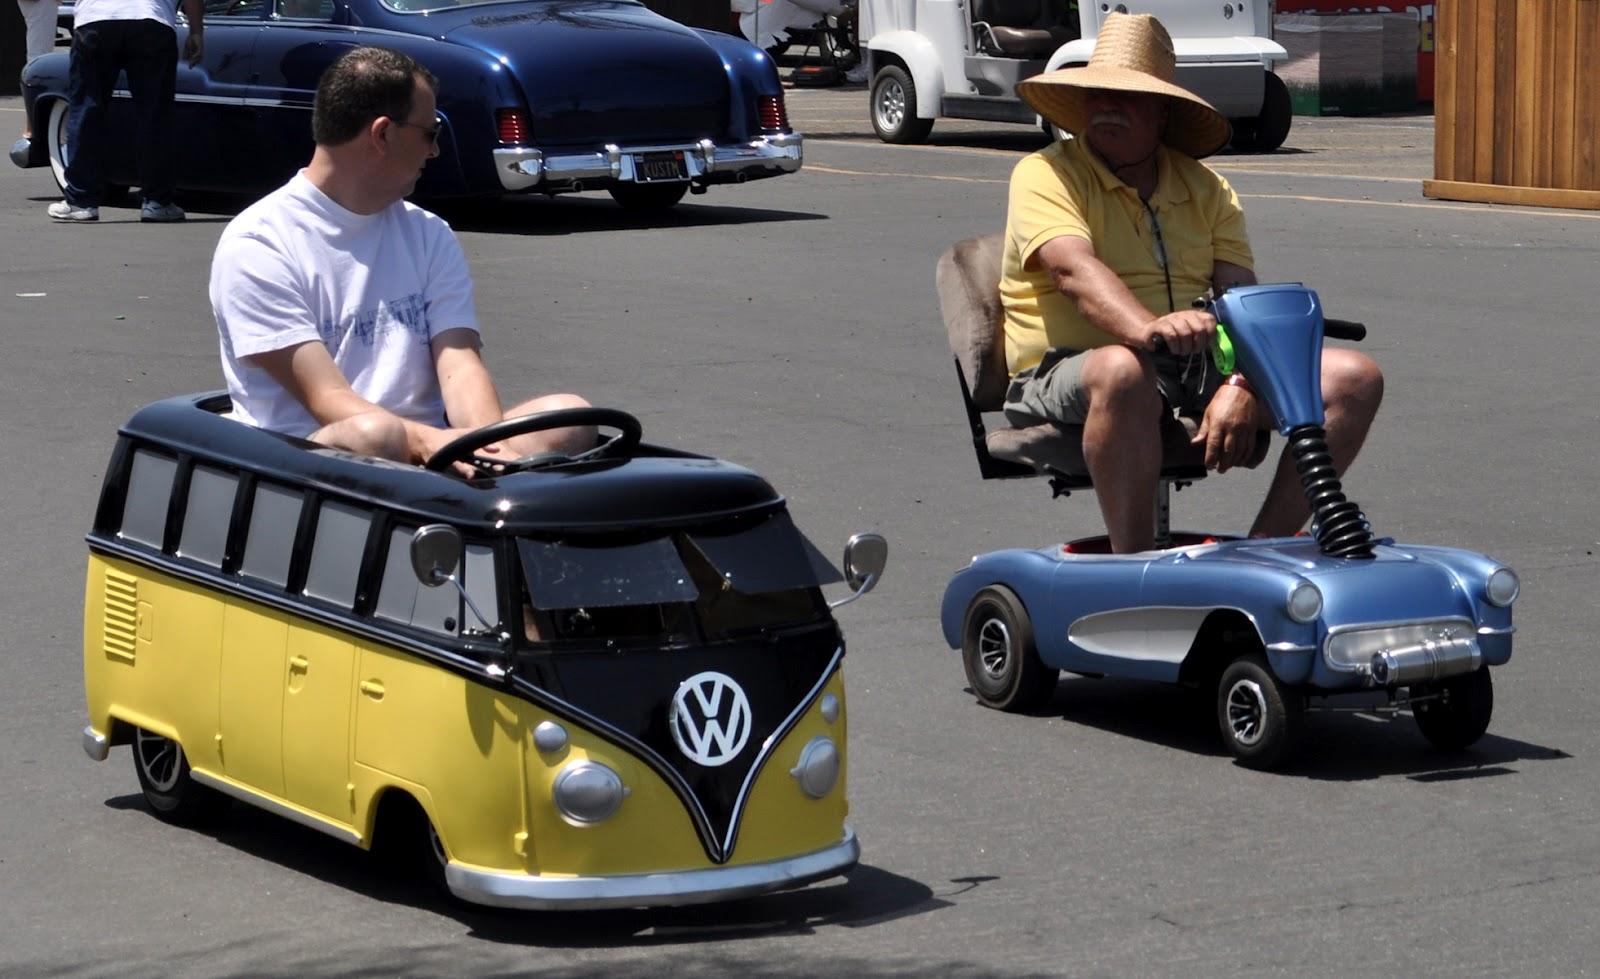 wheelchair hot wheels stackable banquet chairs rod hooligans drag racing through the swap meet